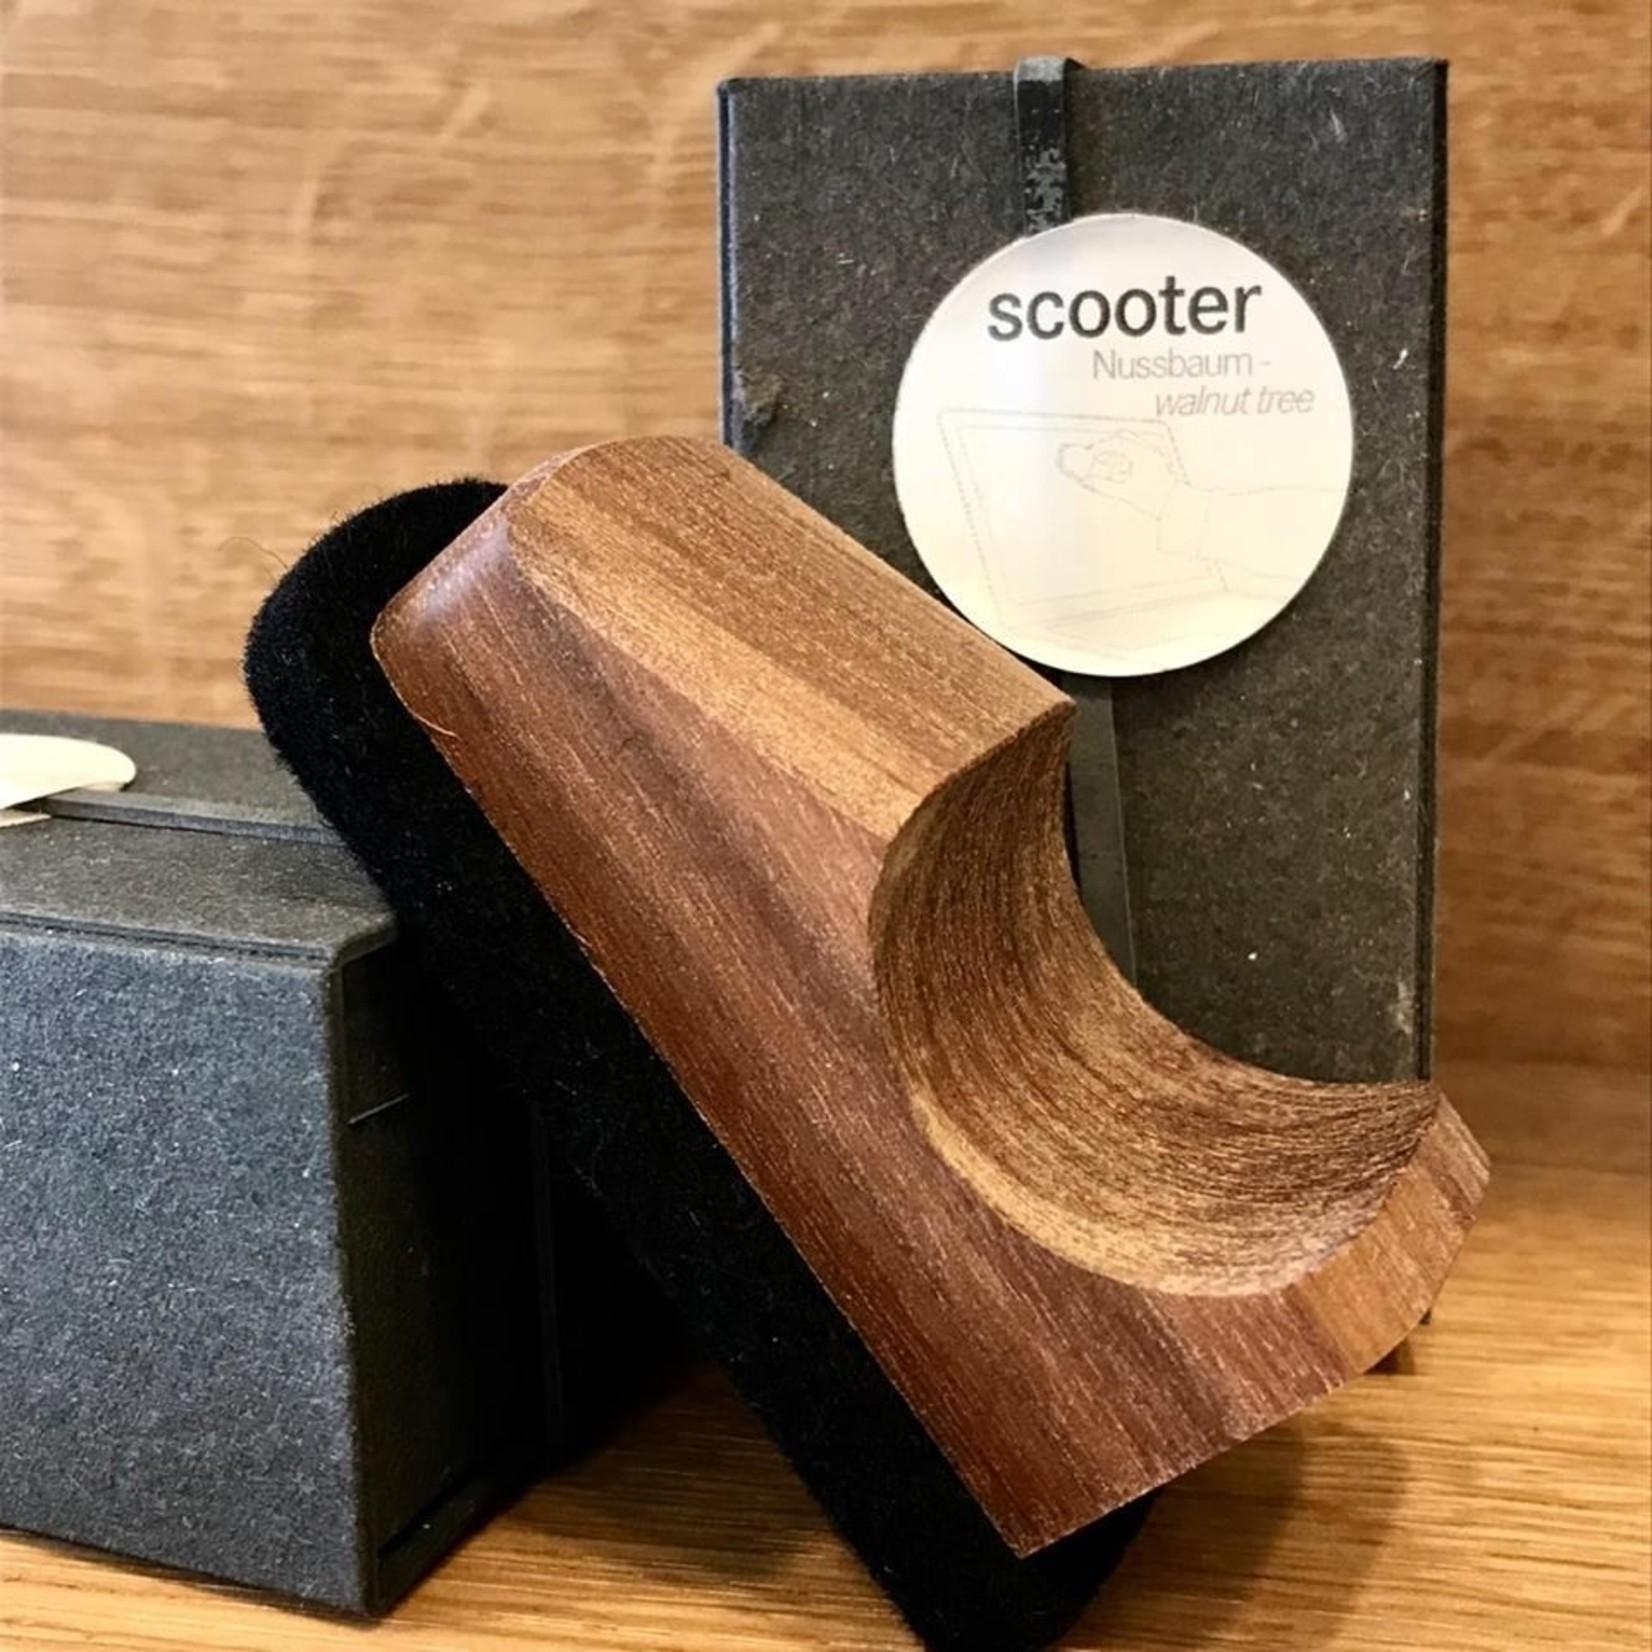 Raumgestalt Raumgestalt Screen Cleaner Scooter, Walnut Wood